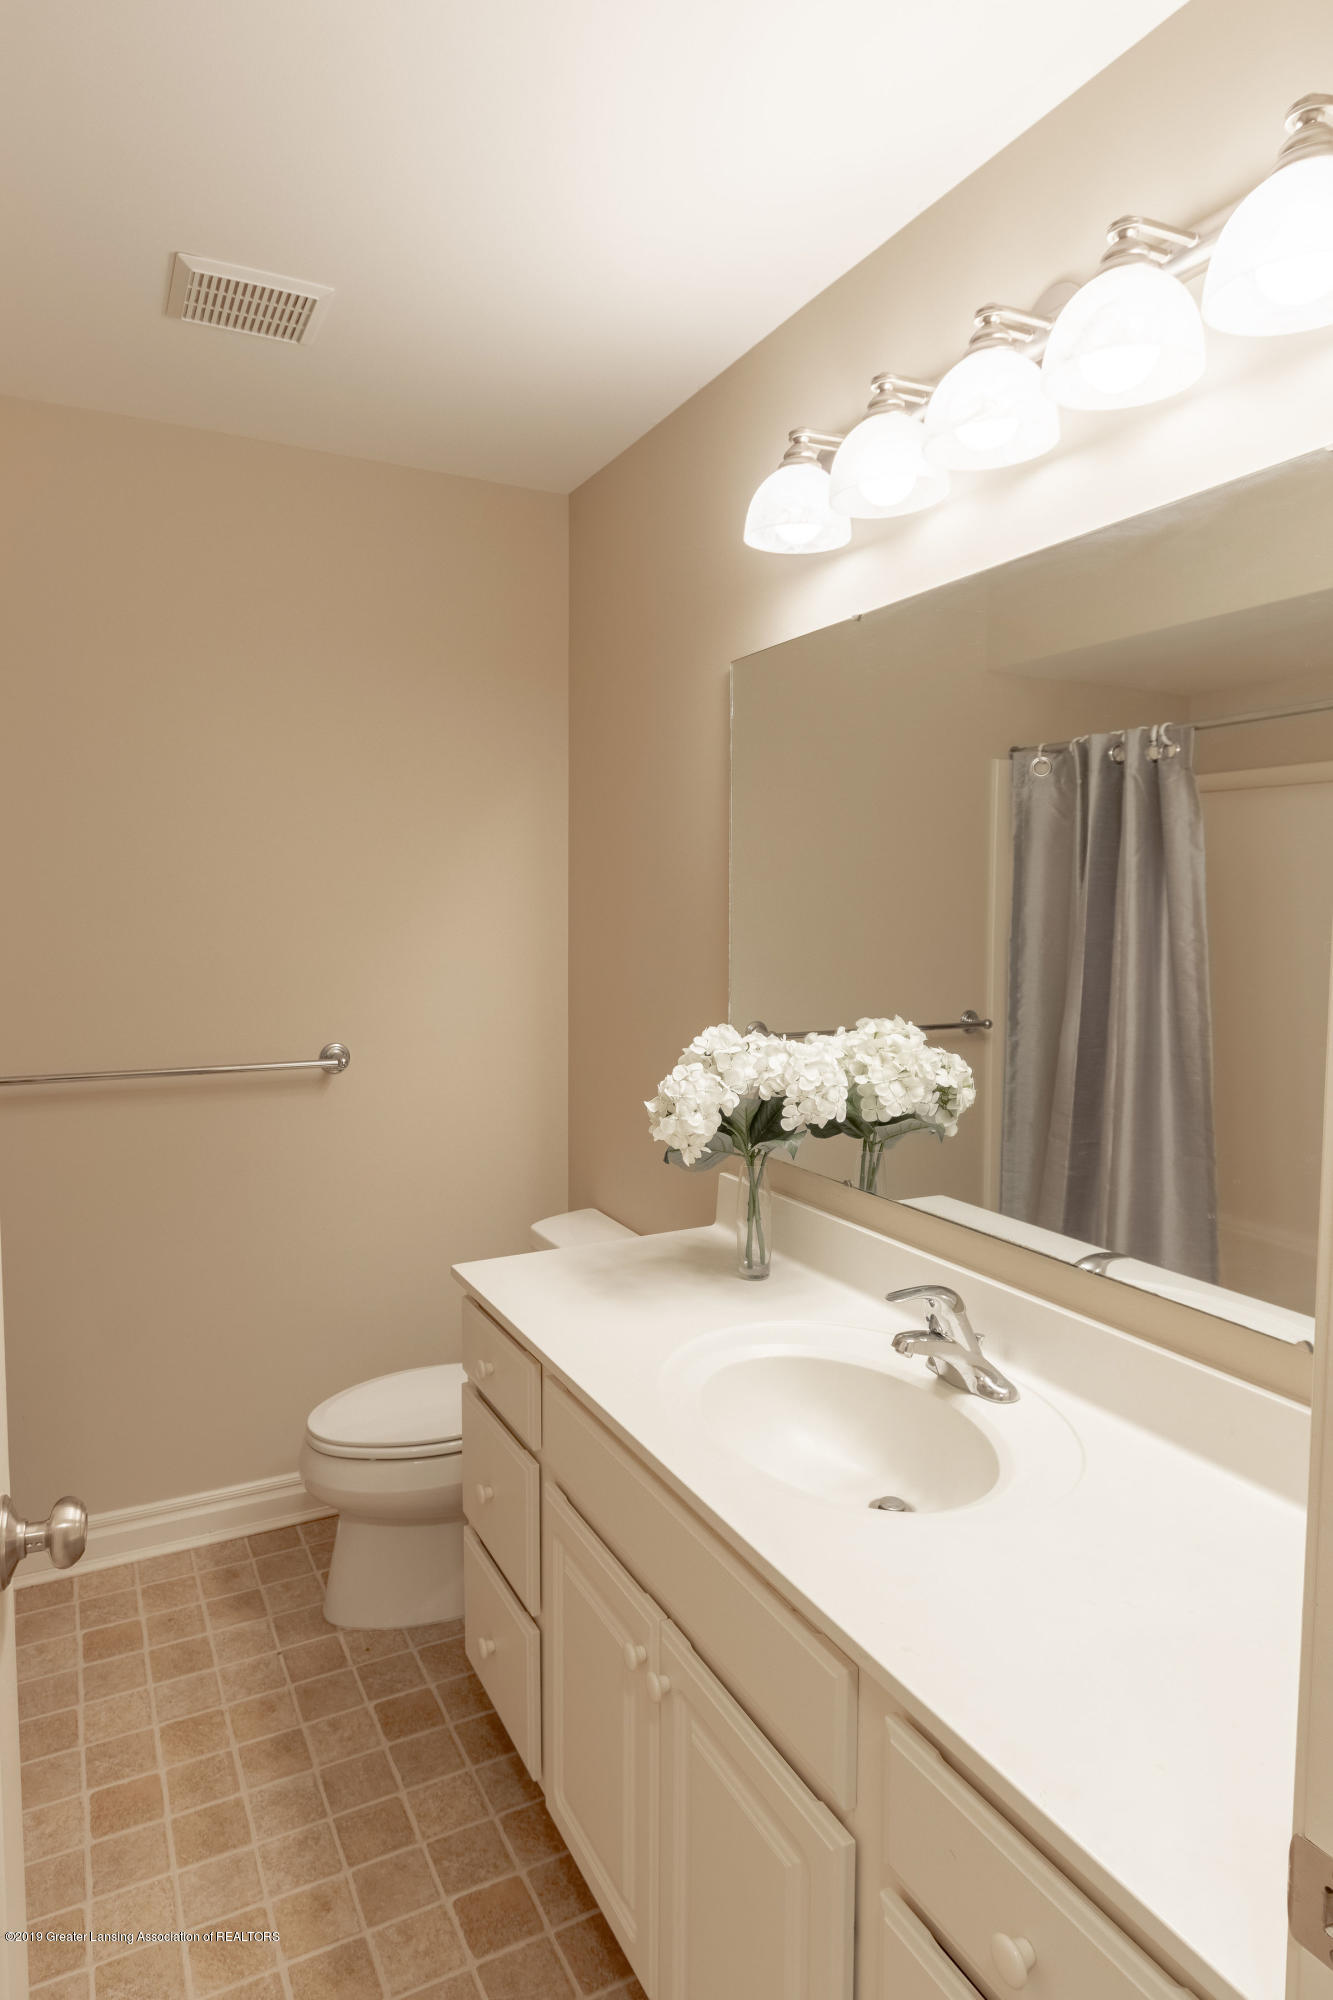 3585 W Arbutus Dr - Main Bathroom - 34